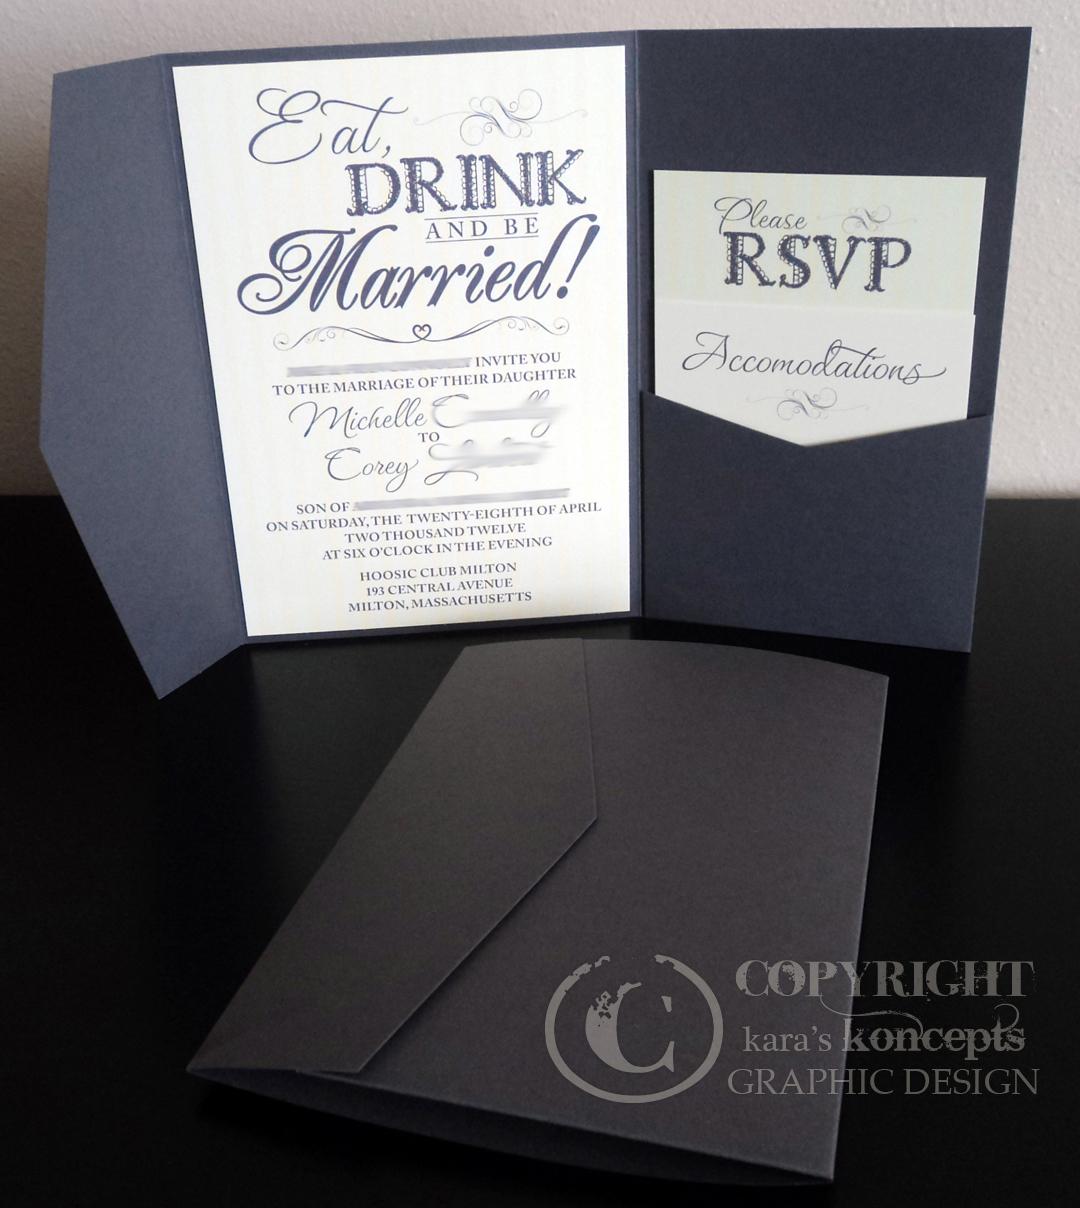 kara's koncepts graphic design - custom wedding invitations, Wedding invitations